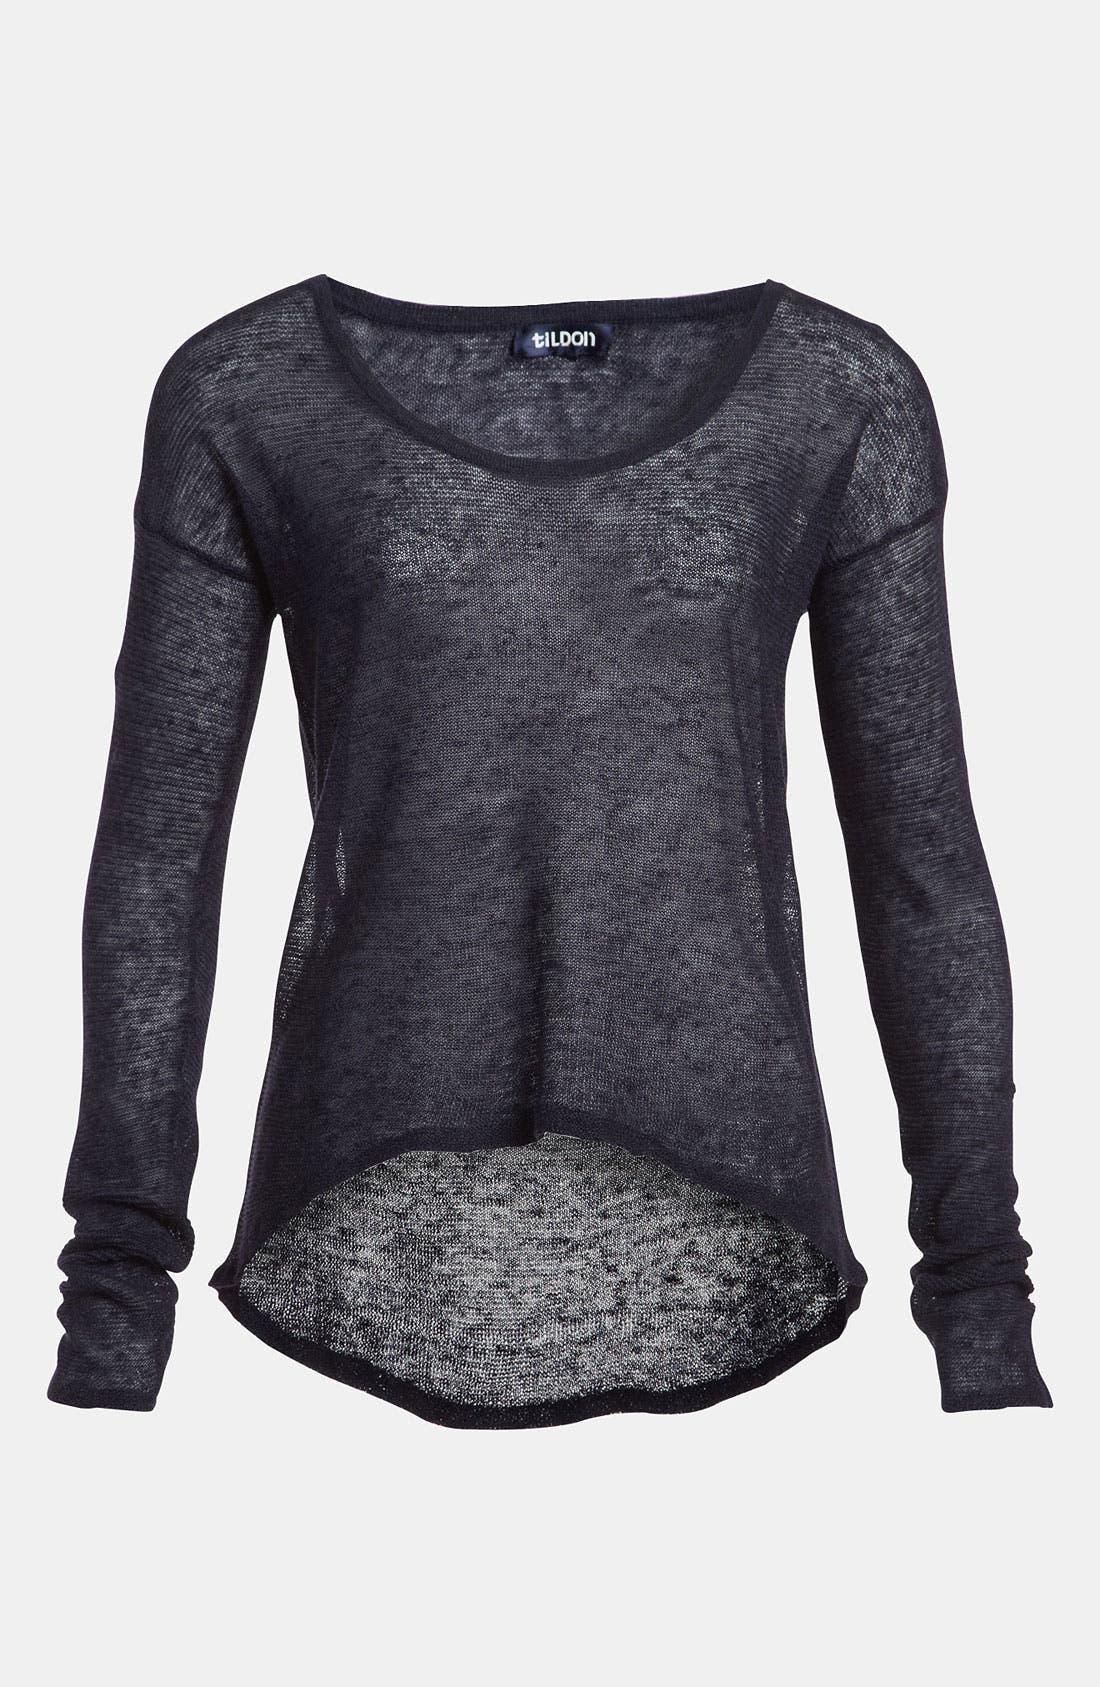 Alternate Image 1 Selected - Tildon Sheer High/Low Pullover